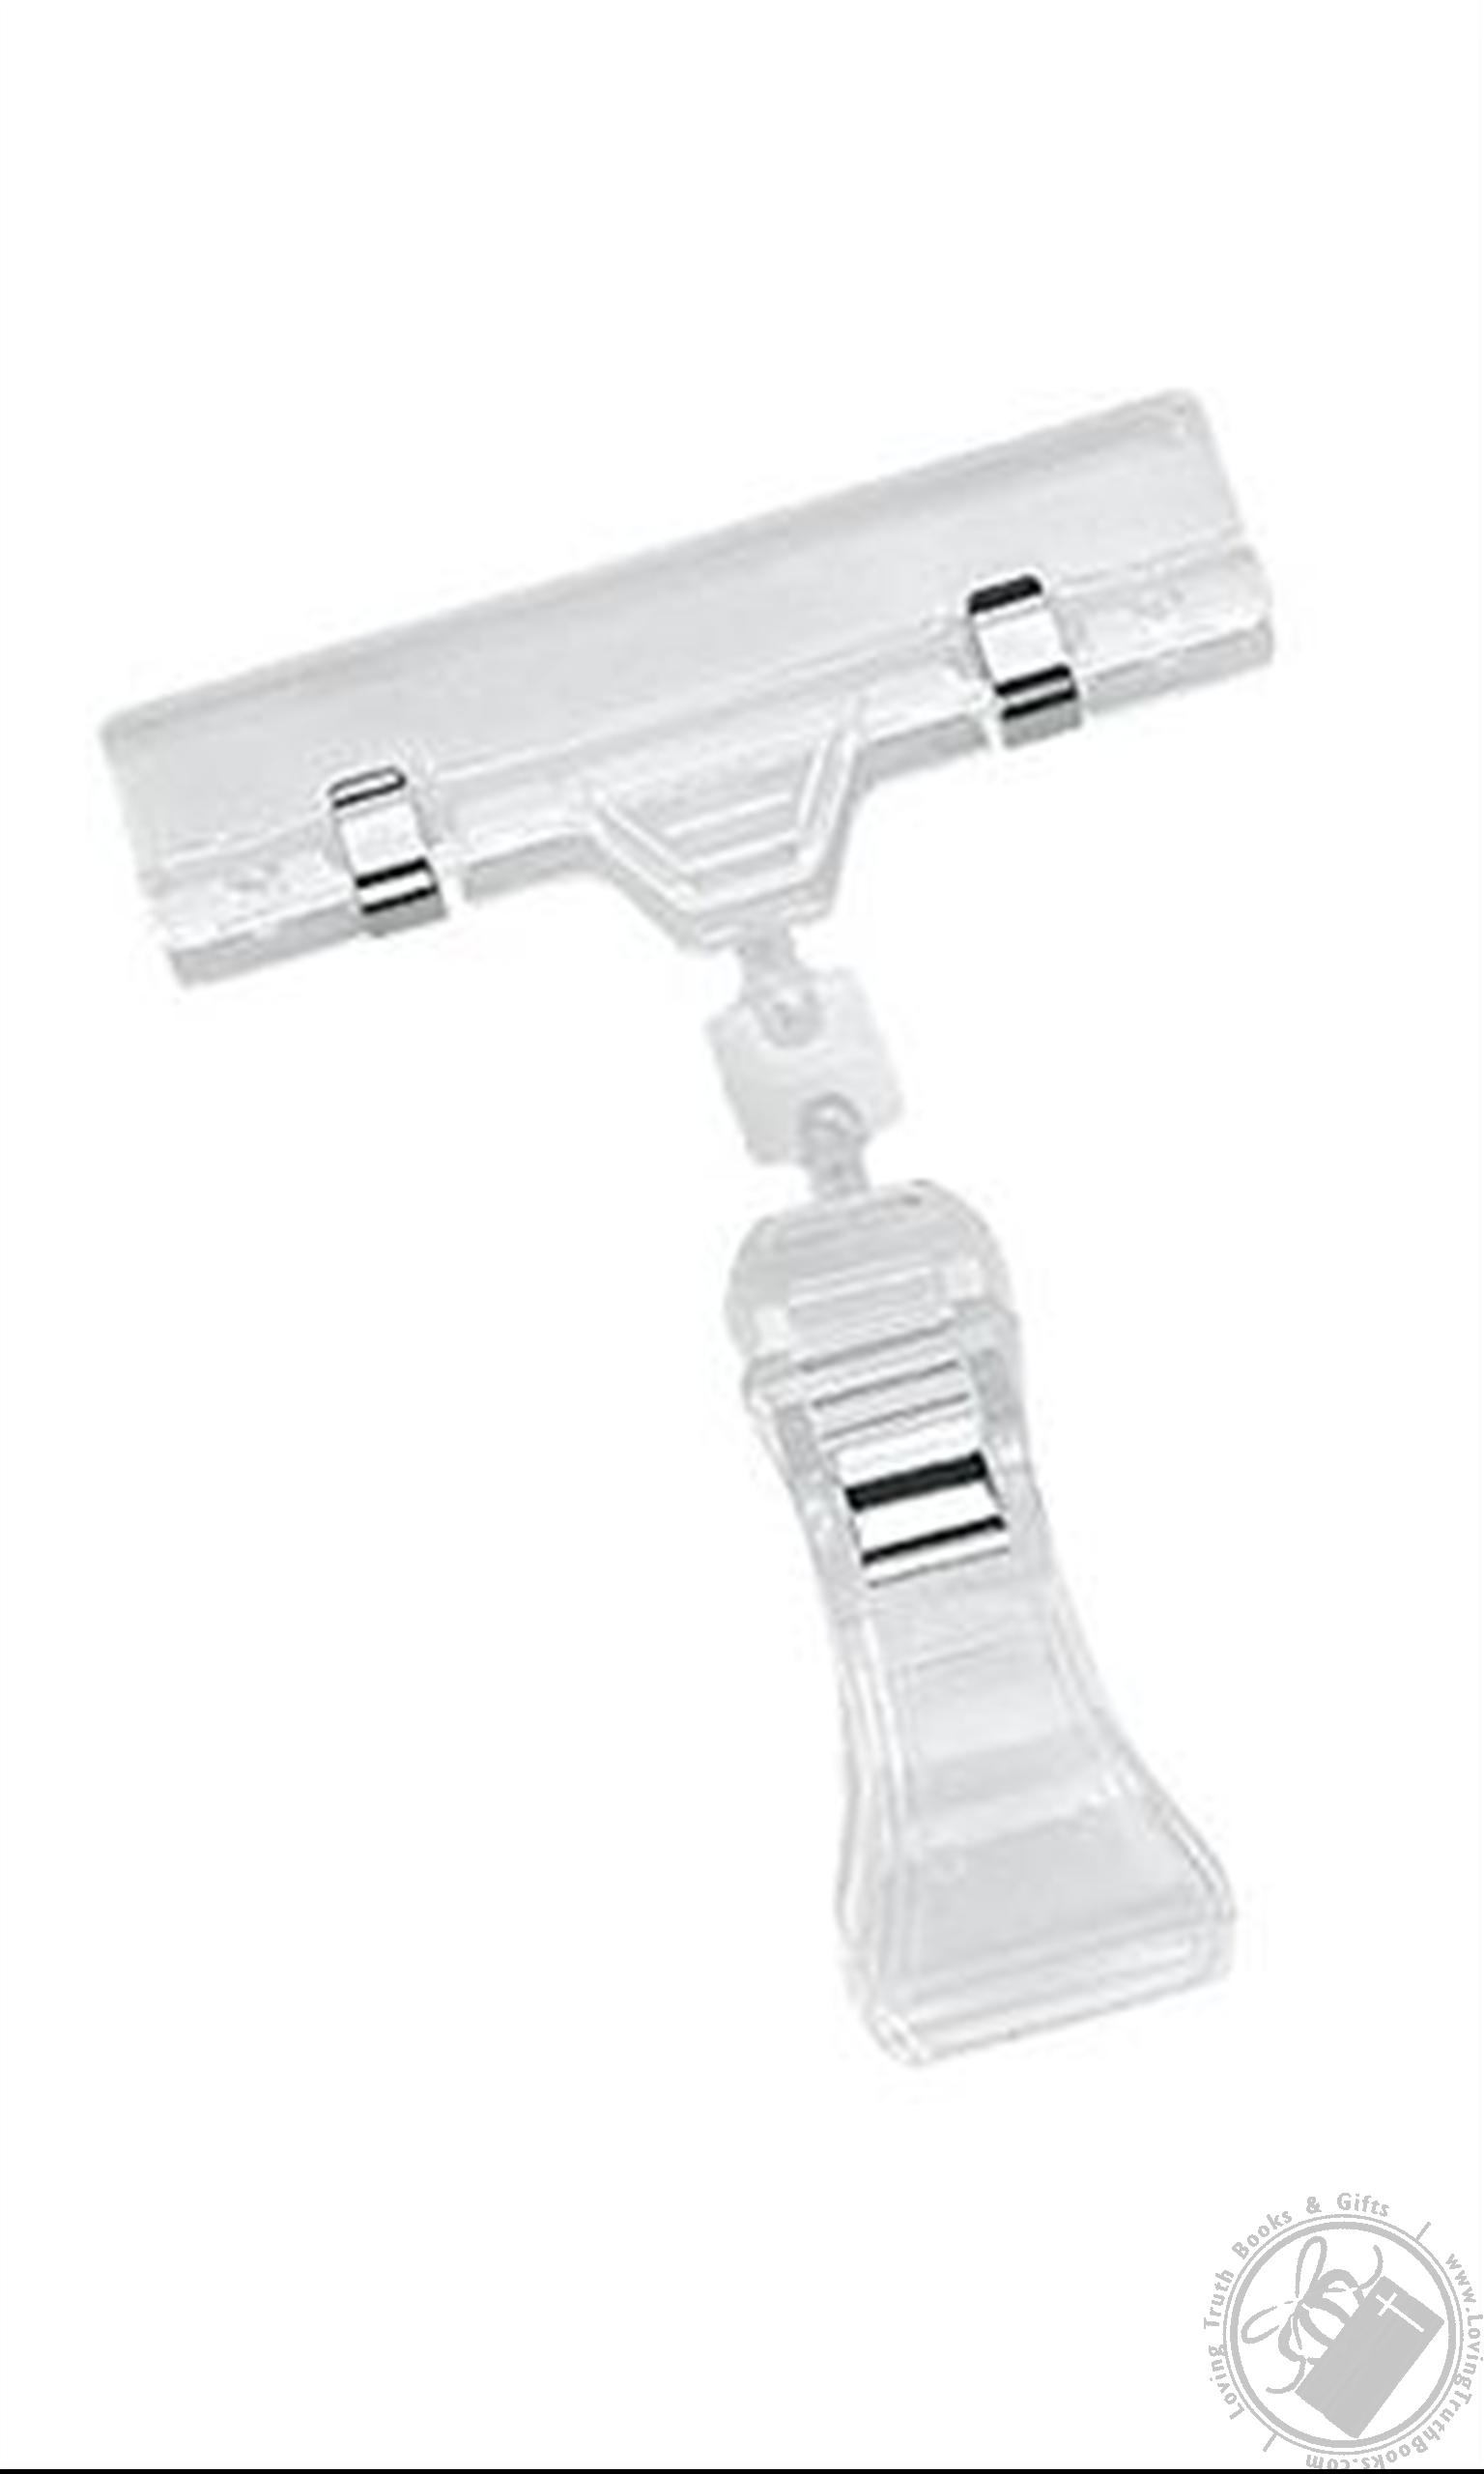 Set 2 Clear Pop Adjustable Clip Sign Holders Retail Sign